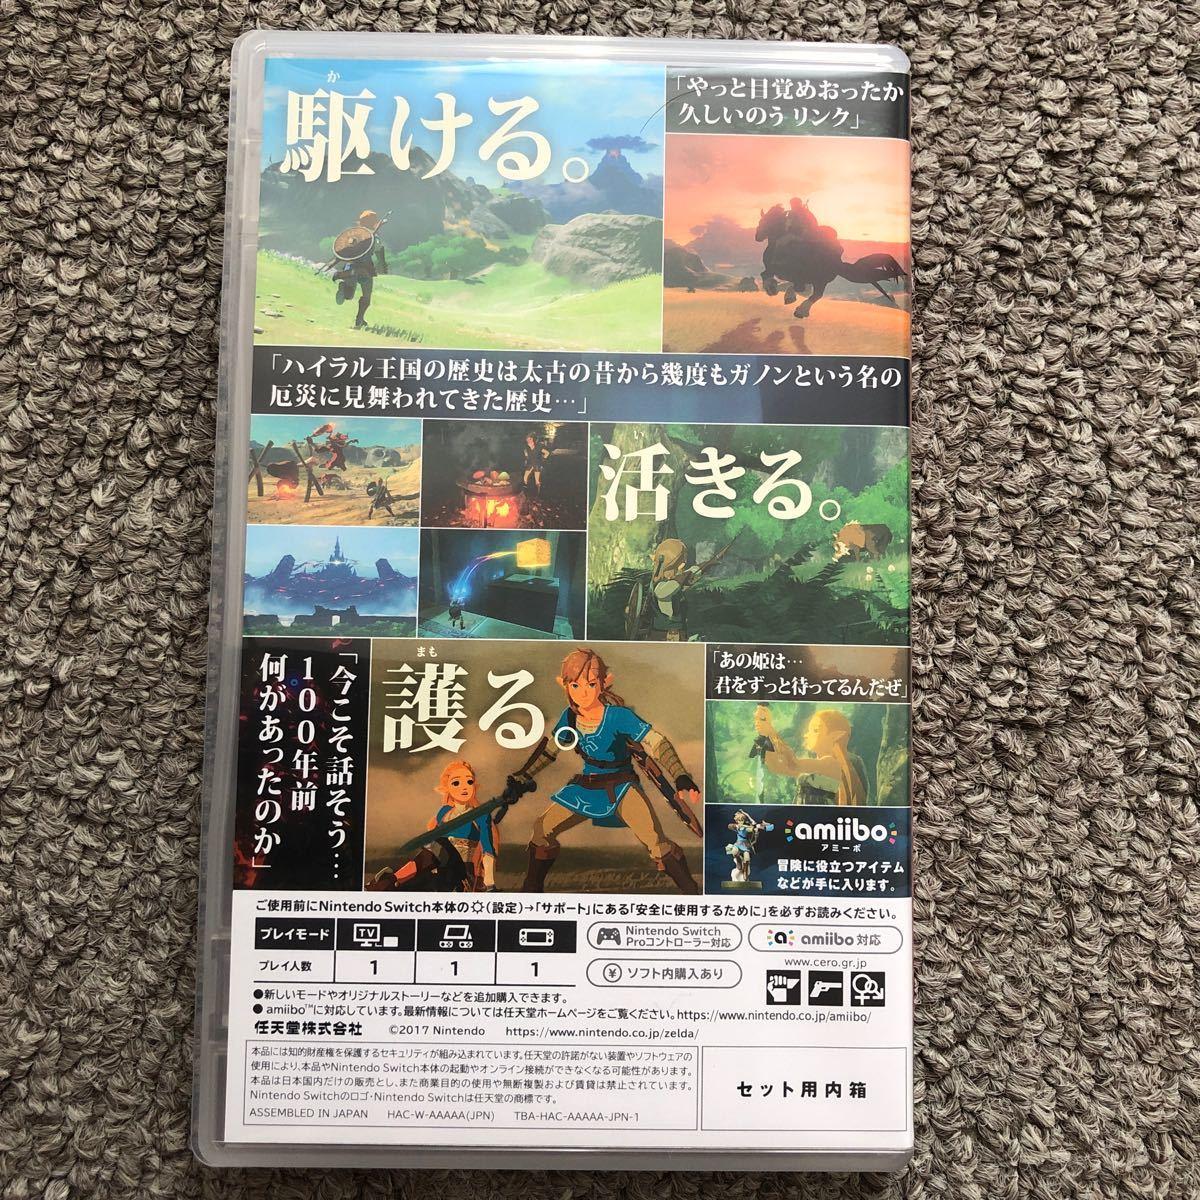 【Switch】 ゼルダの伝説 ブレス オブ ザ ワイルド [冒険ガイドブック&マップ付き]